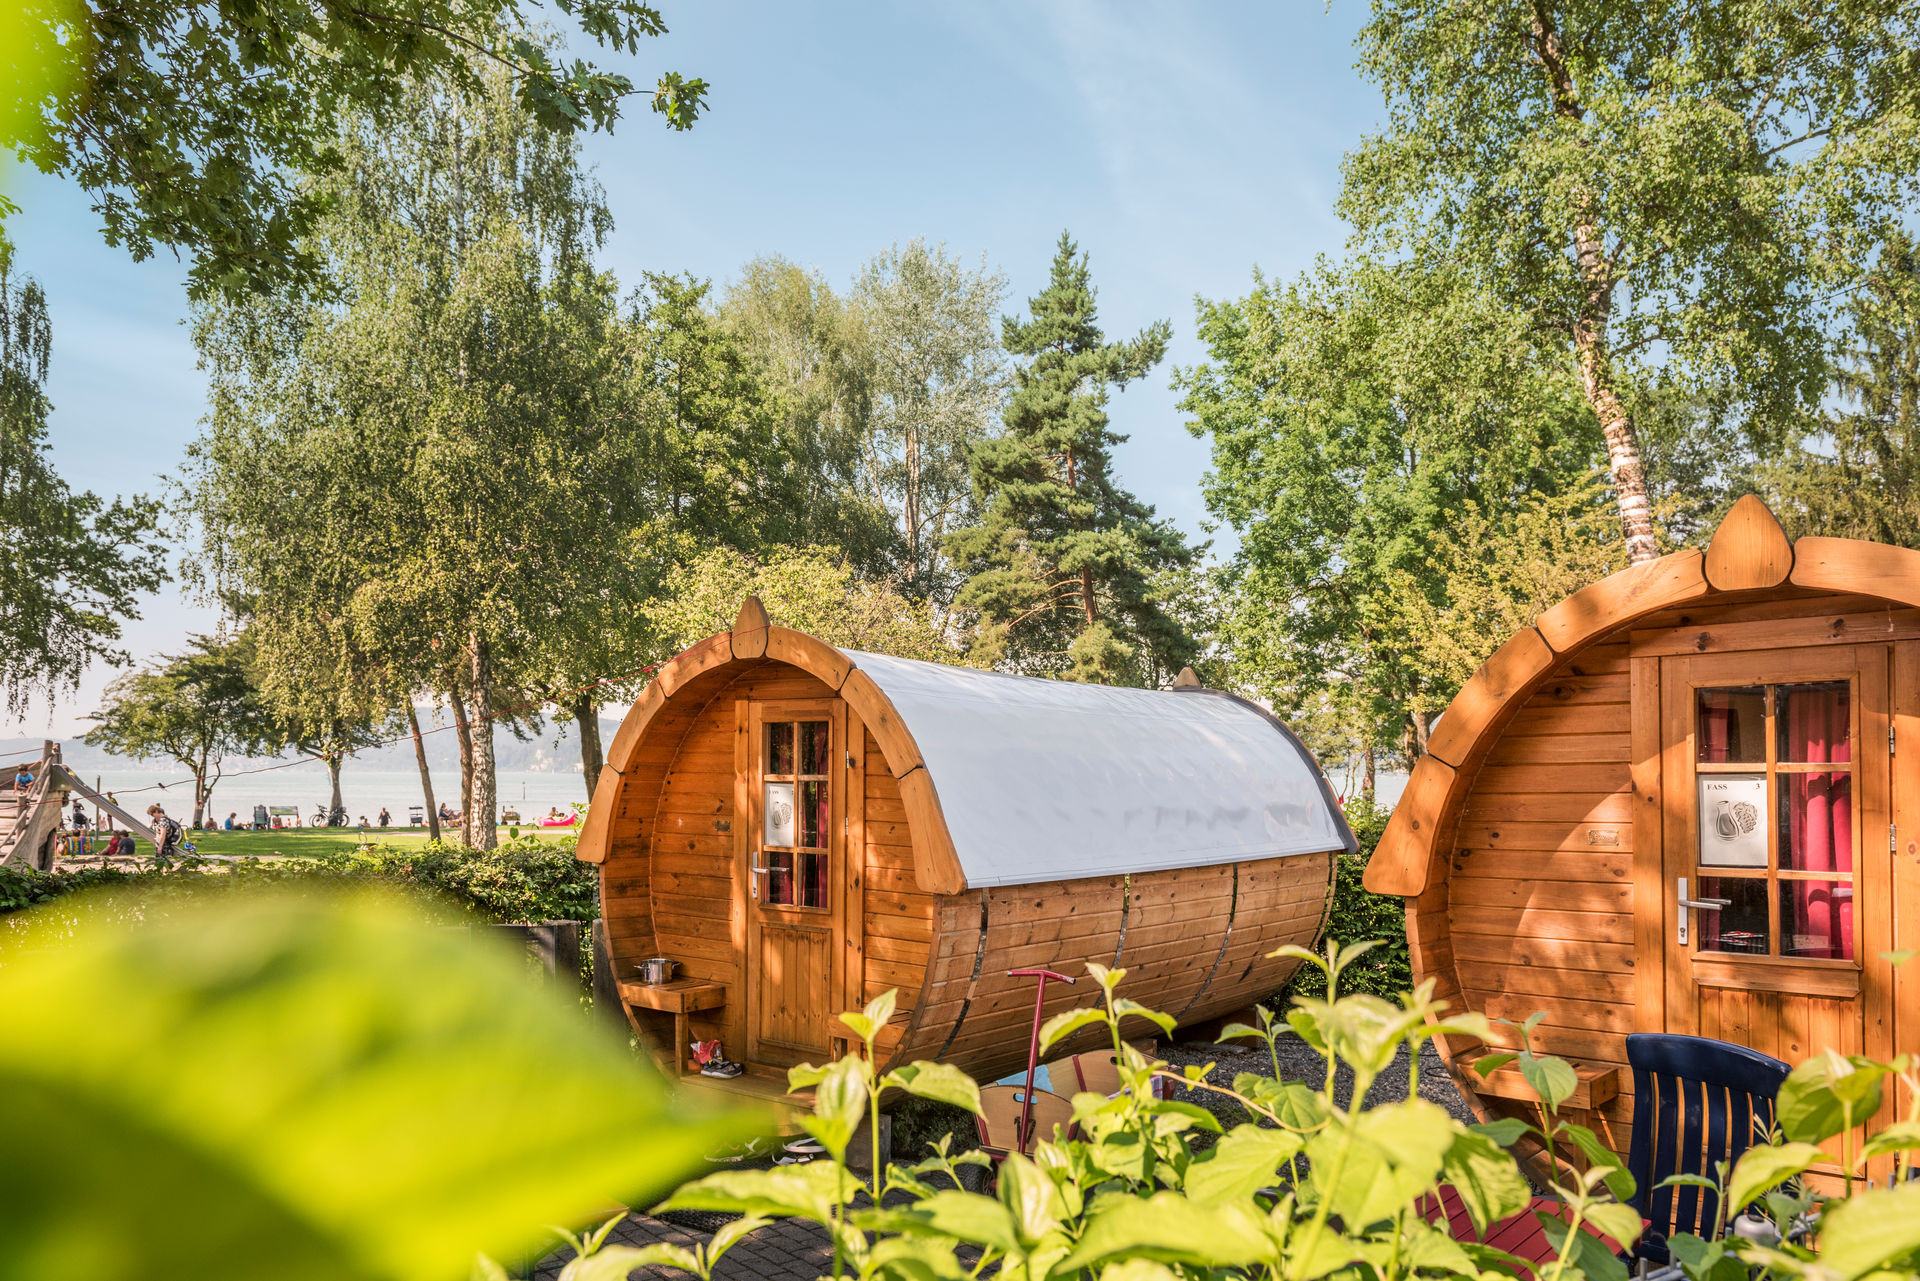 Konstanz-Campingplatz-Klausenhorn-Schlaffaesser-08_Herbst_Copyright_MTK-Dagmar-Schwelle